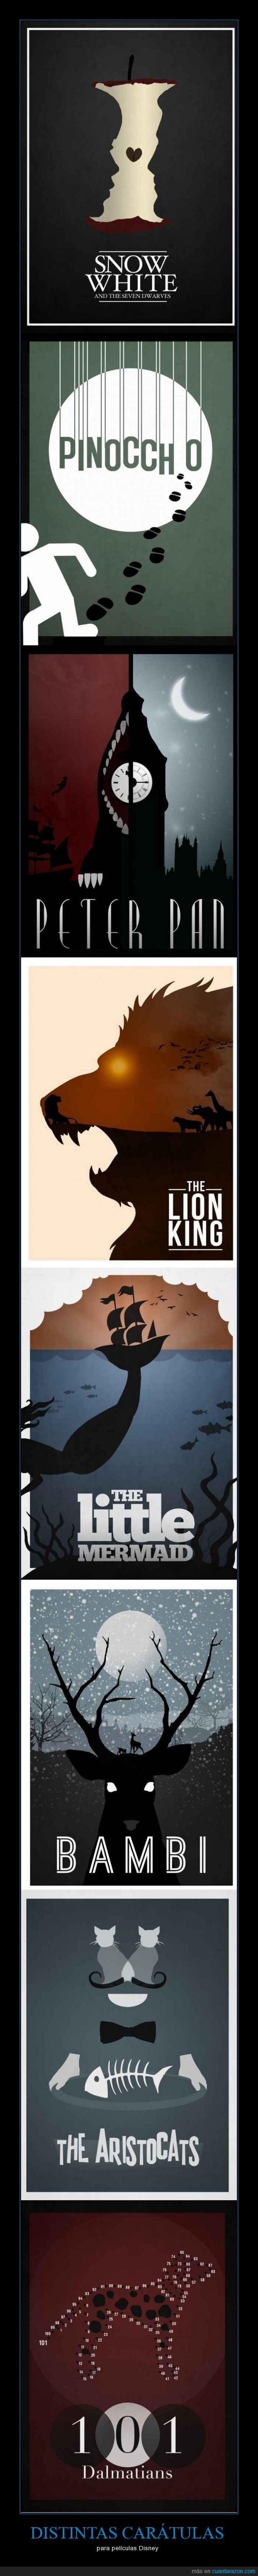 Bambi,caratulas,dalmatas,disney,El rey leon,imagenes,La sirenita,Peter pan